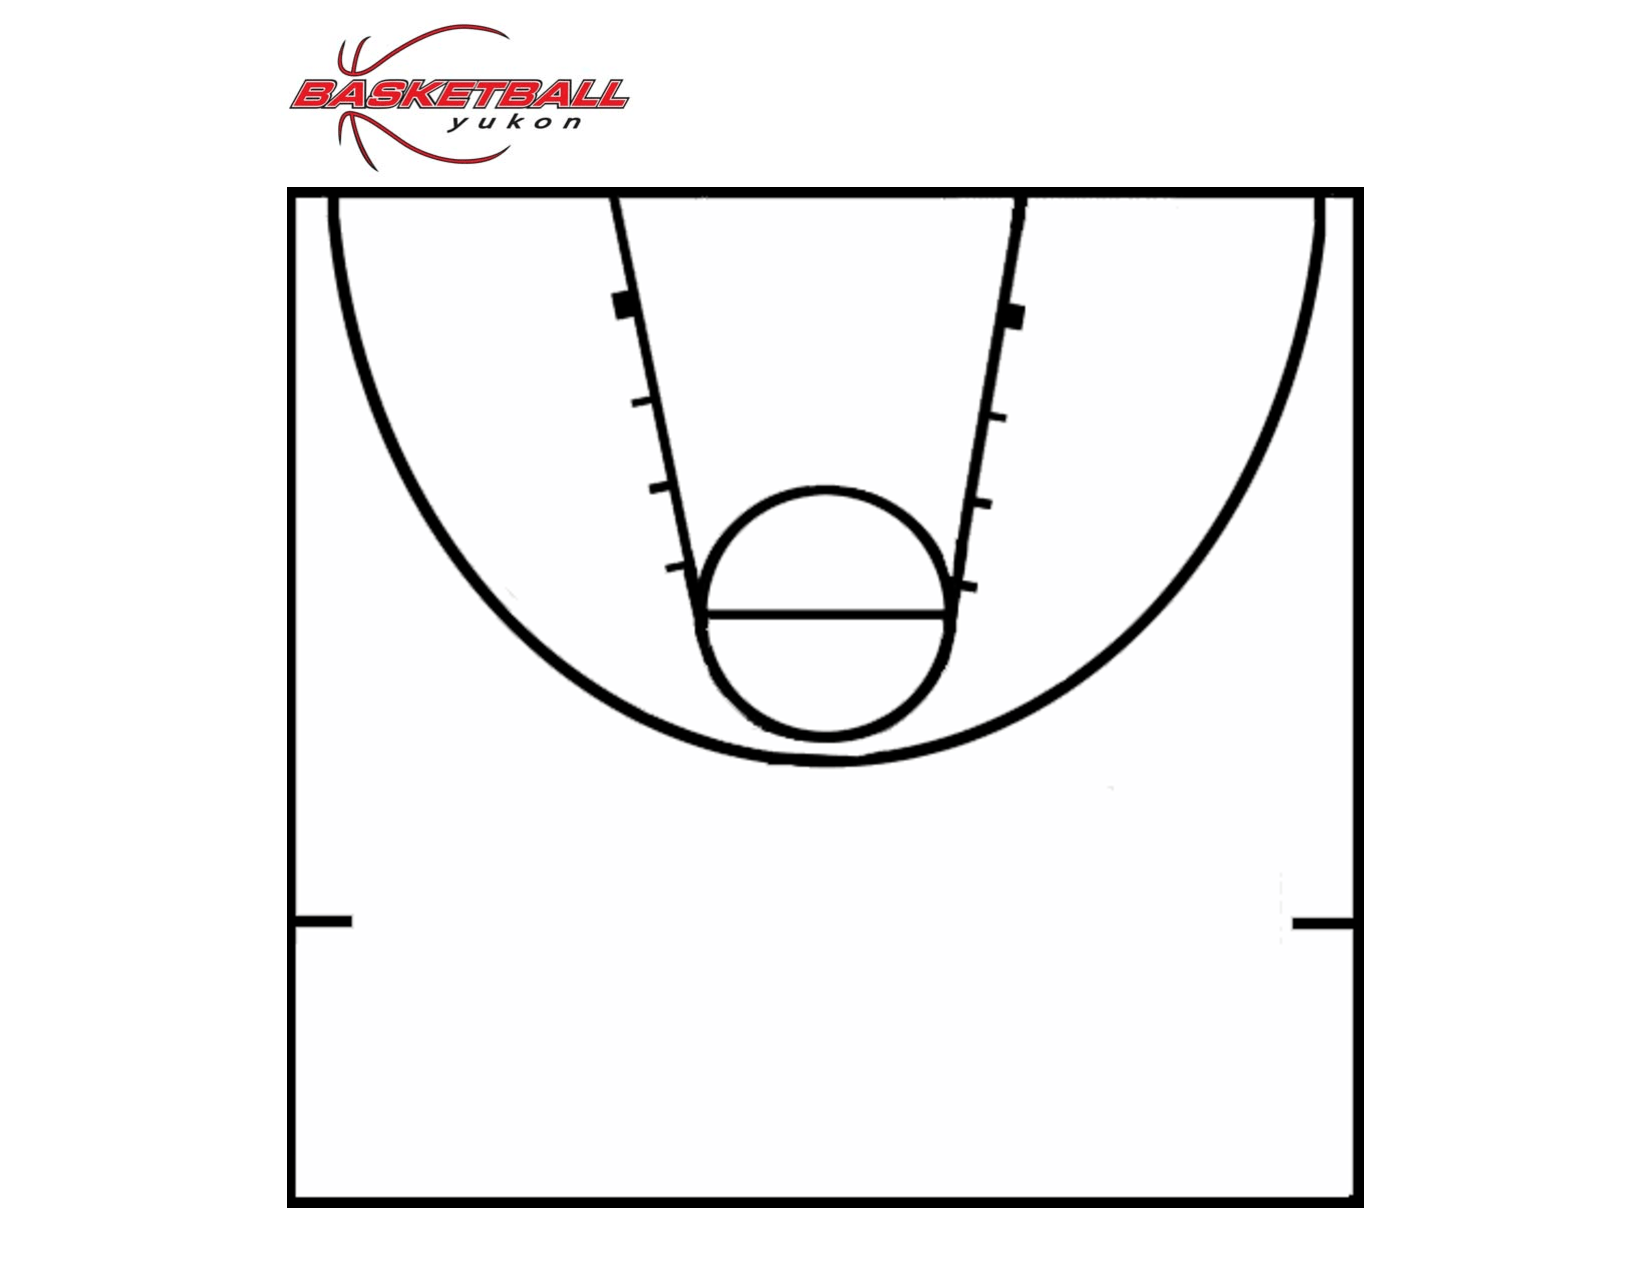 Printable Full Court Basketball Diagrams